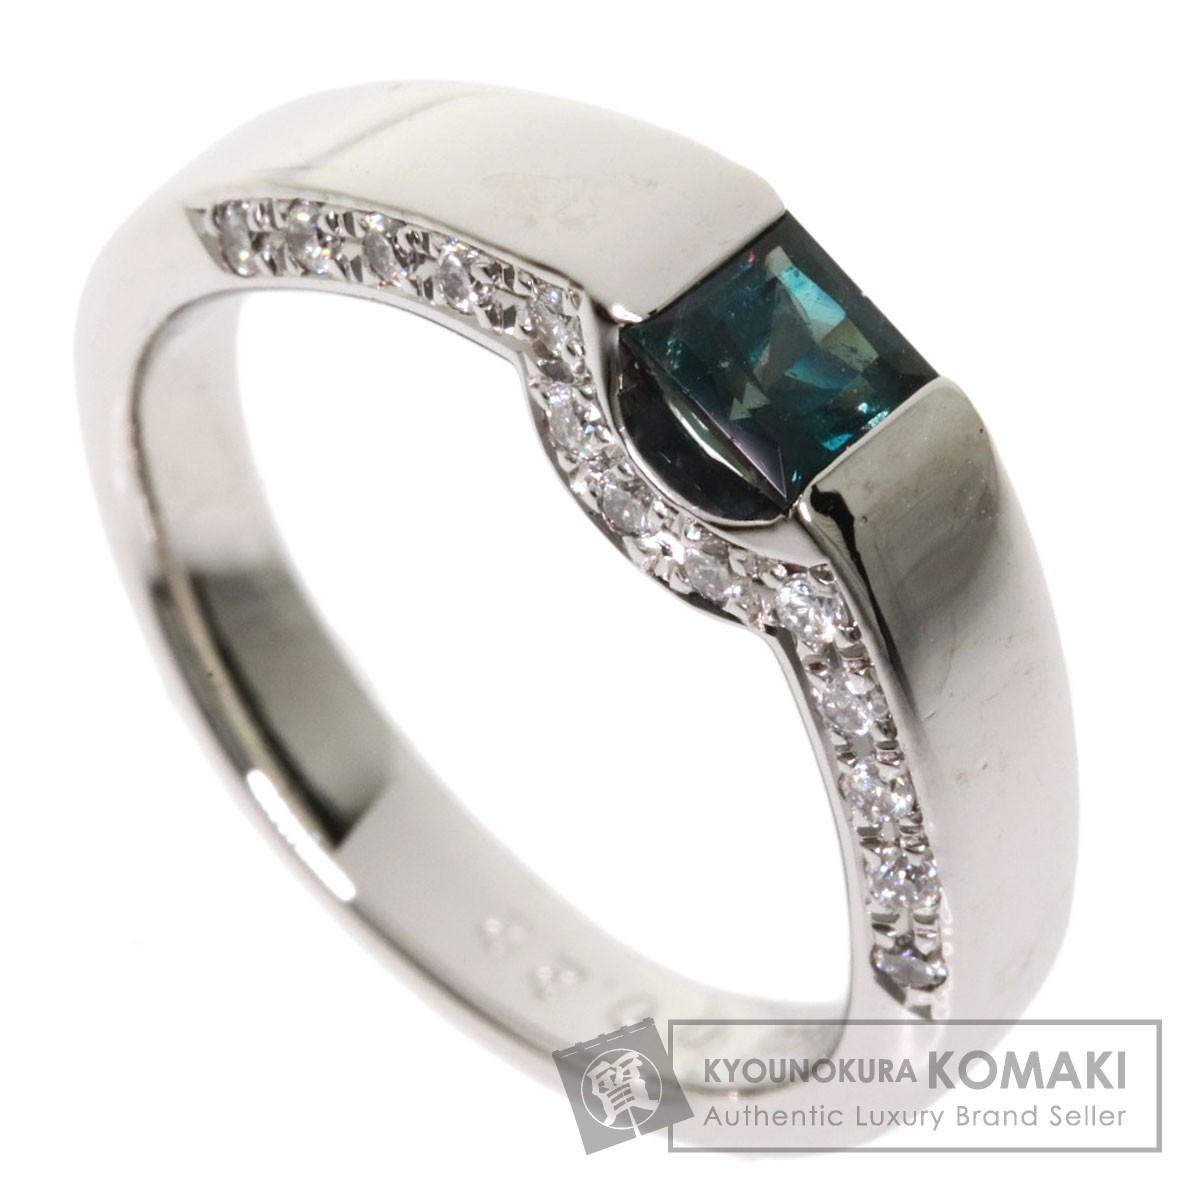 0.38ct アレキサンドライト ダイヤモンド リング・指輪 プラチナPT900 8.1g レディース 【中古】